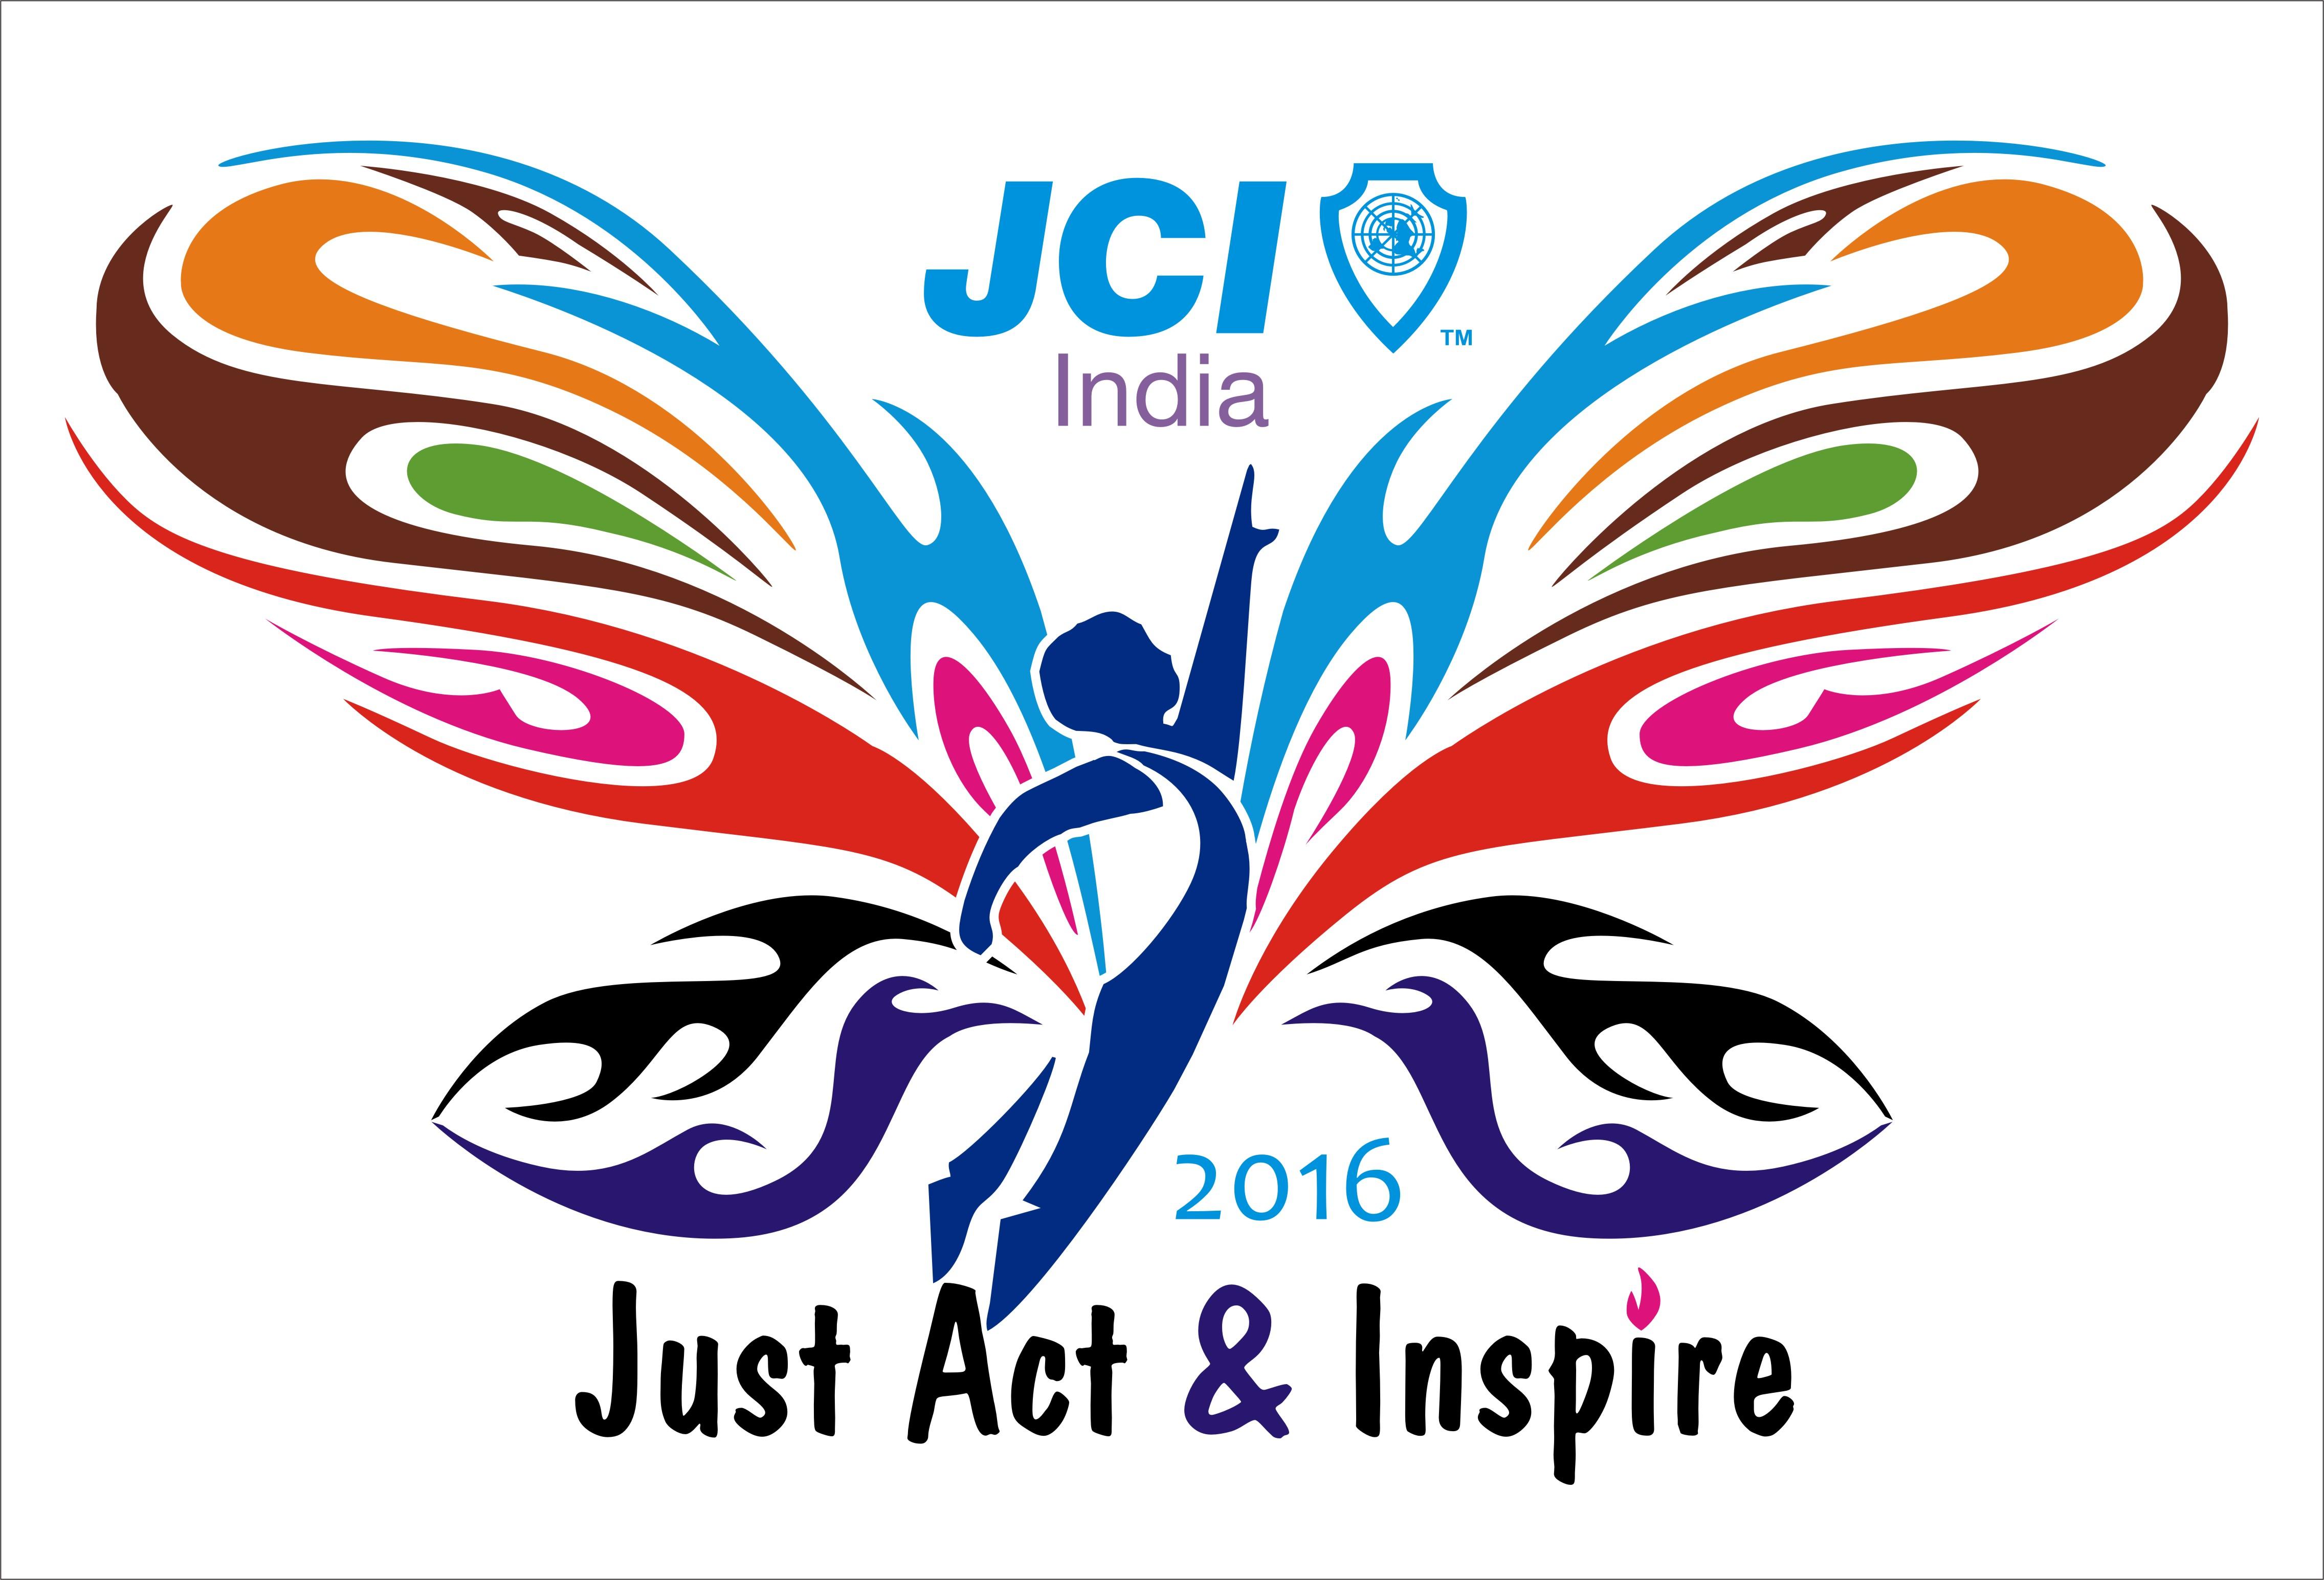 jci_india_2016_focus_area_logo